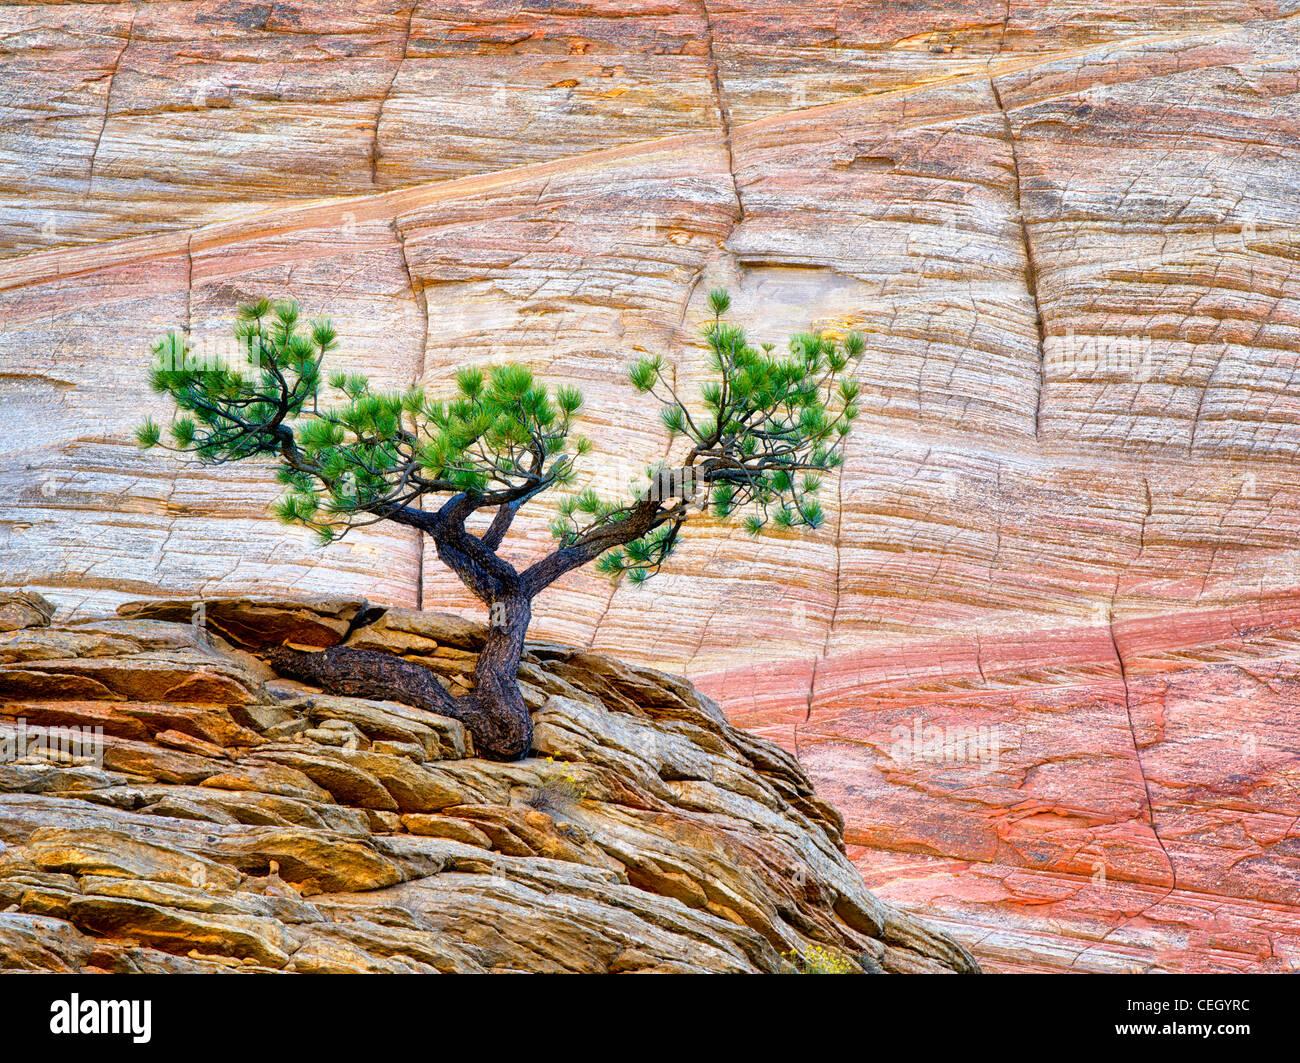 Bonsai ponderosa pine tree struggling to survive and Cherboard Mesa. Zion National Park, Utah. - Stock Image